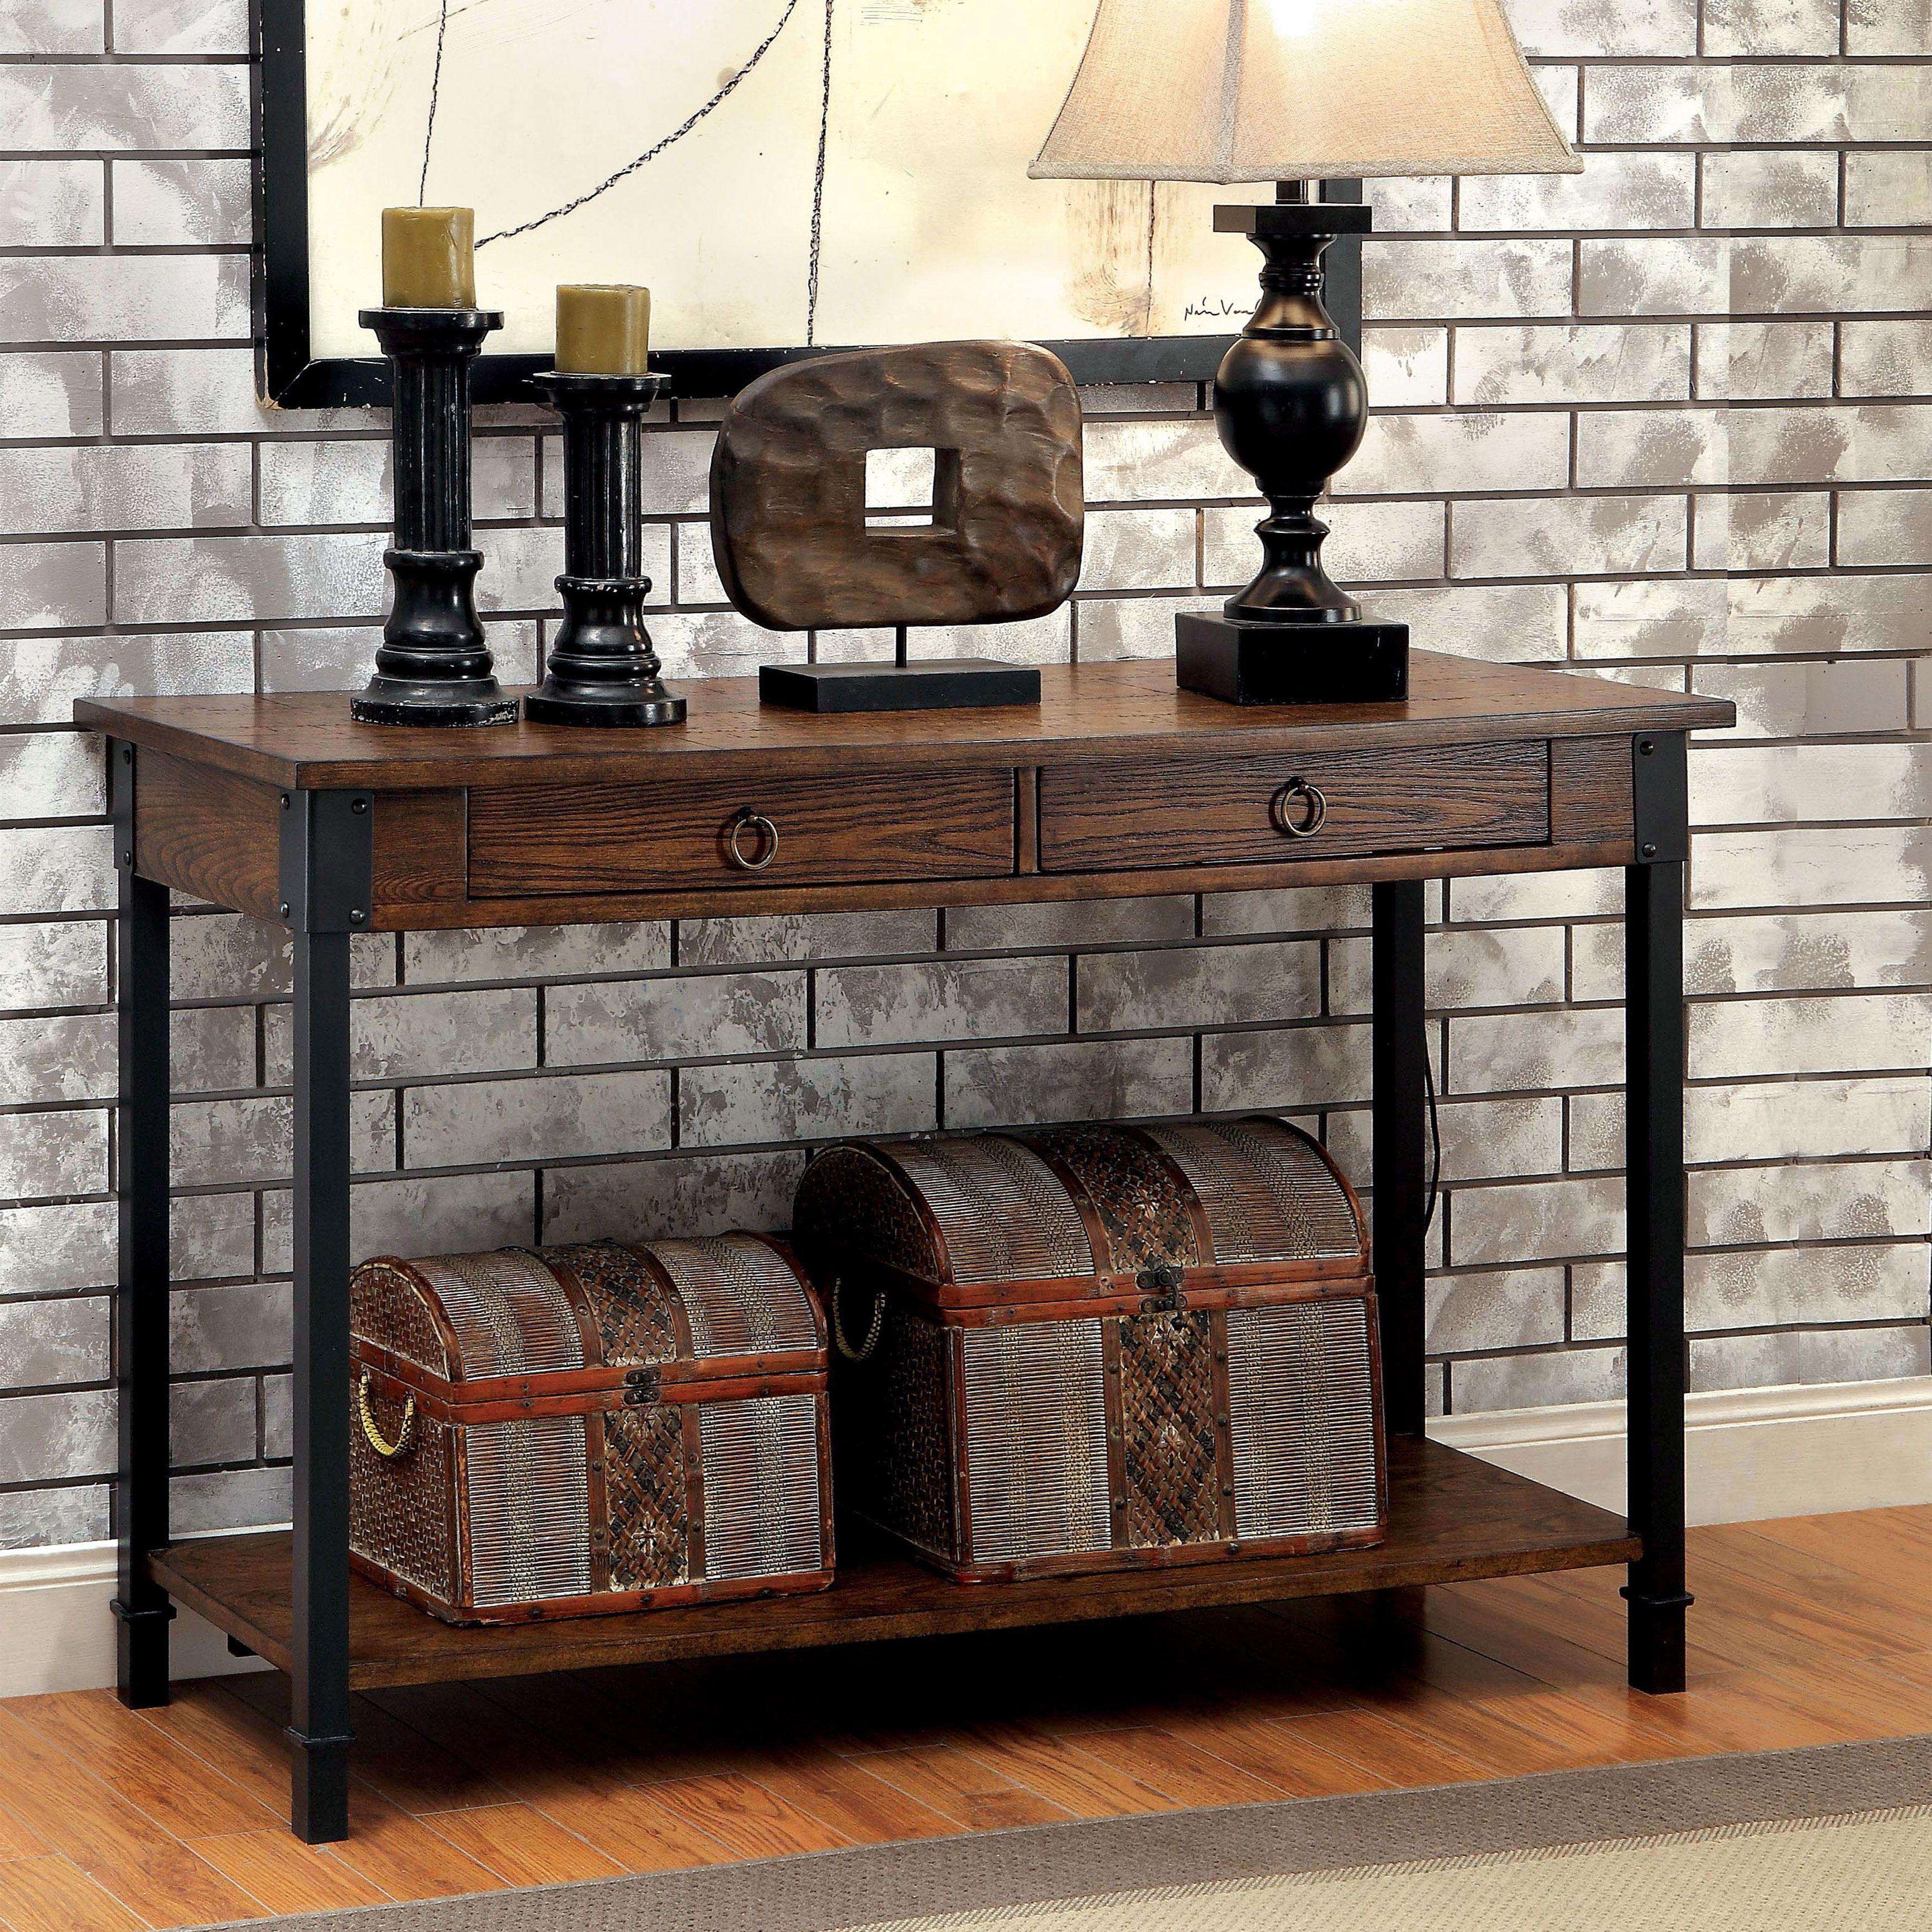 Make sofa table - Furniture Of America Carpenter Rustic Weathered Oak 2 Drawer Sofa Table By Furniture Of America